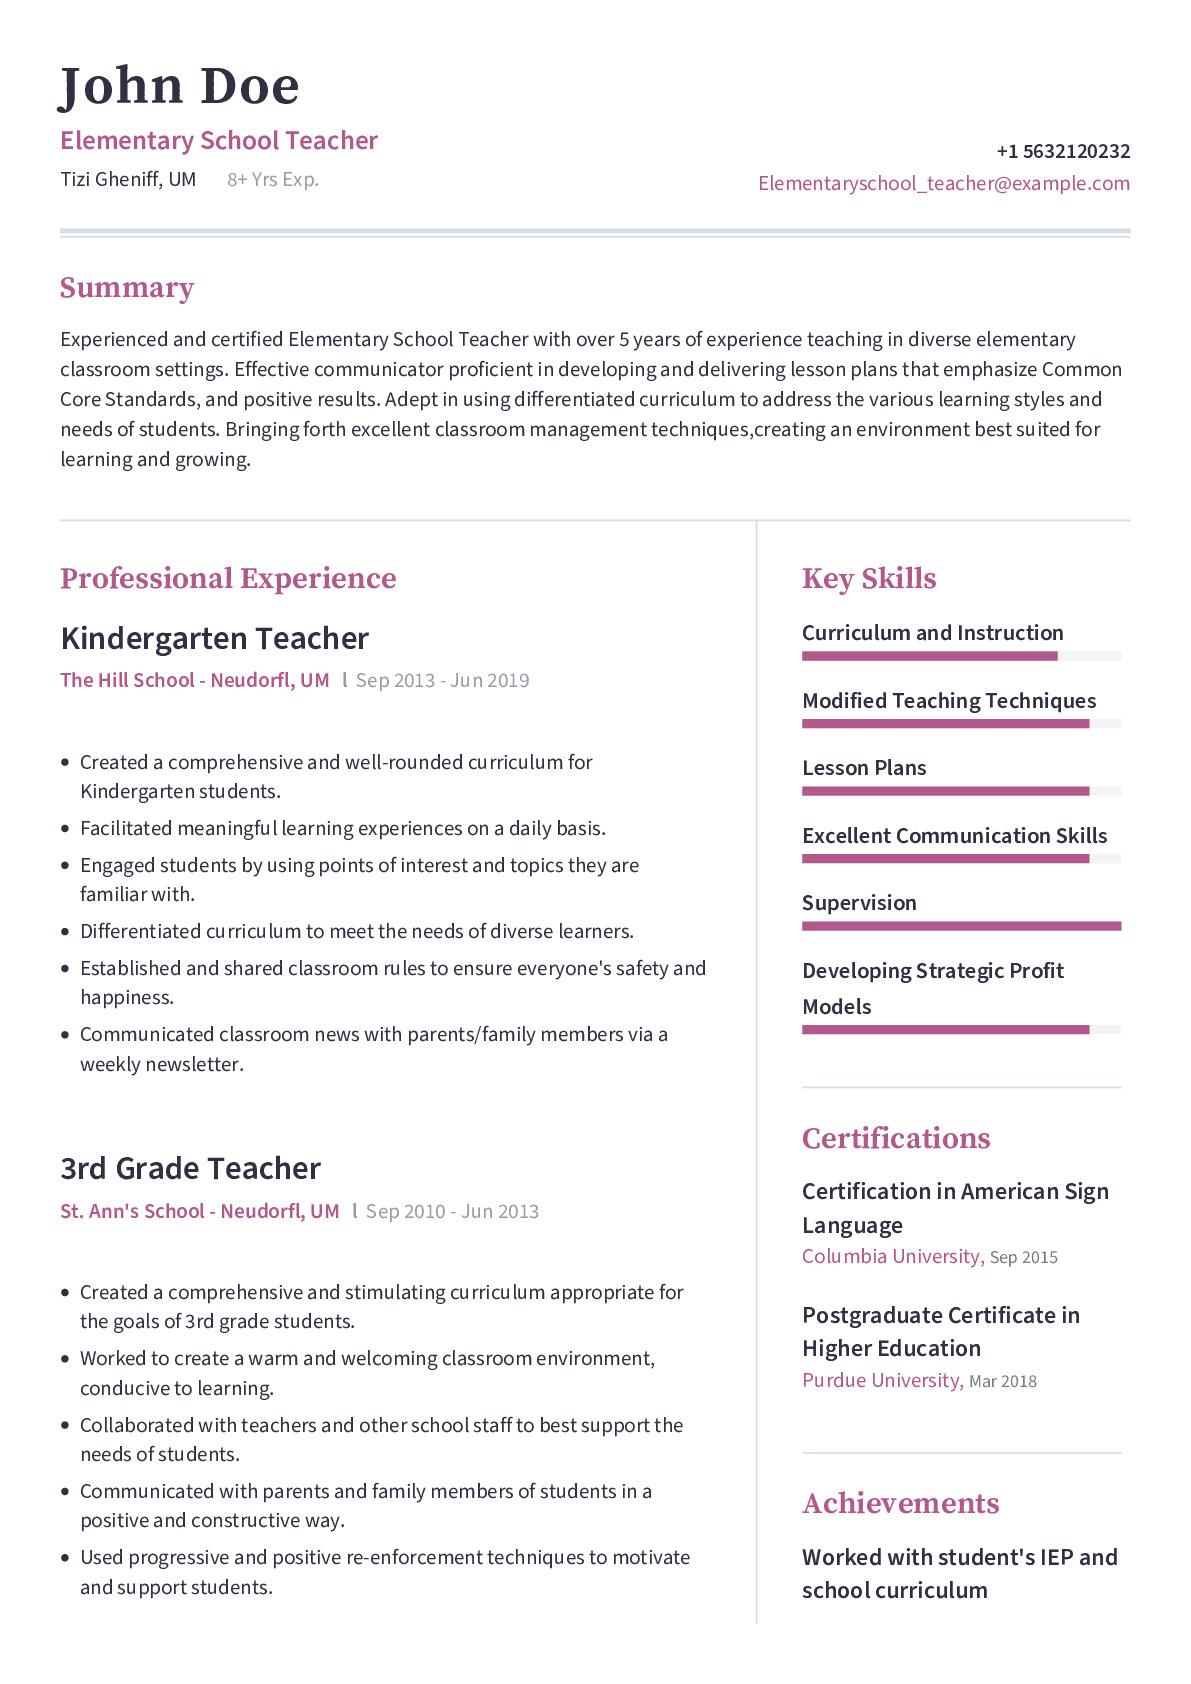 Elementary School Teacher Resume Example